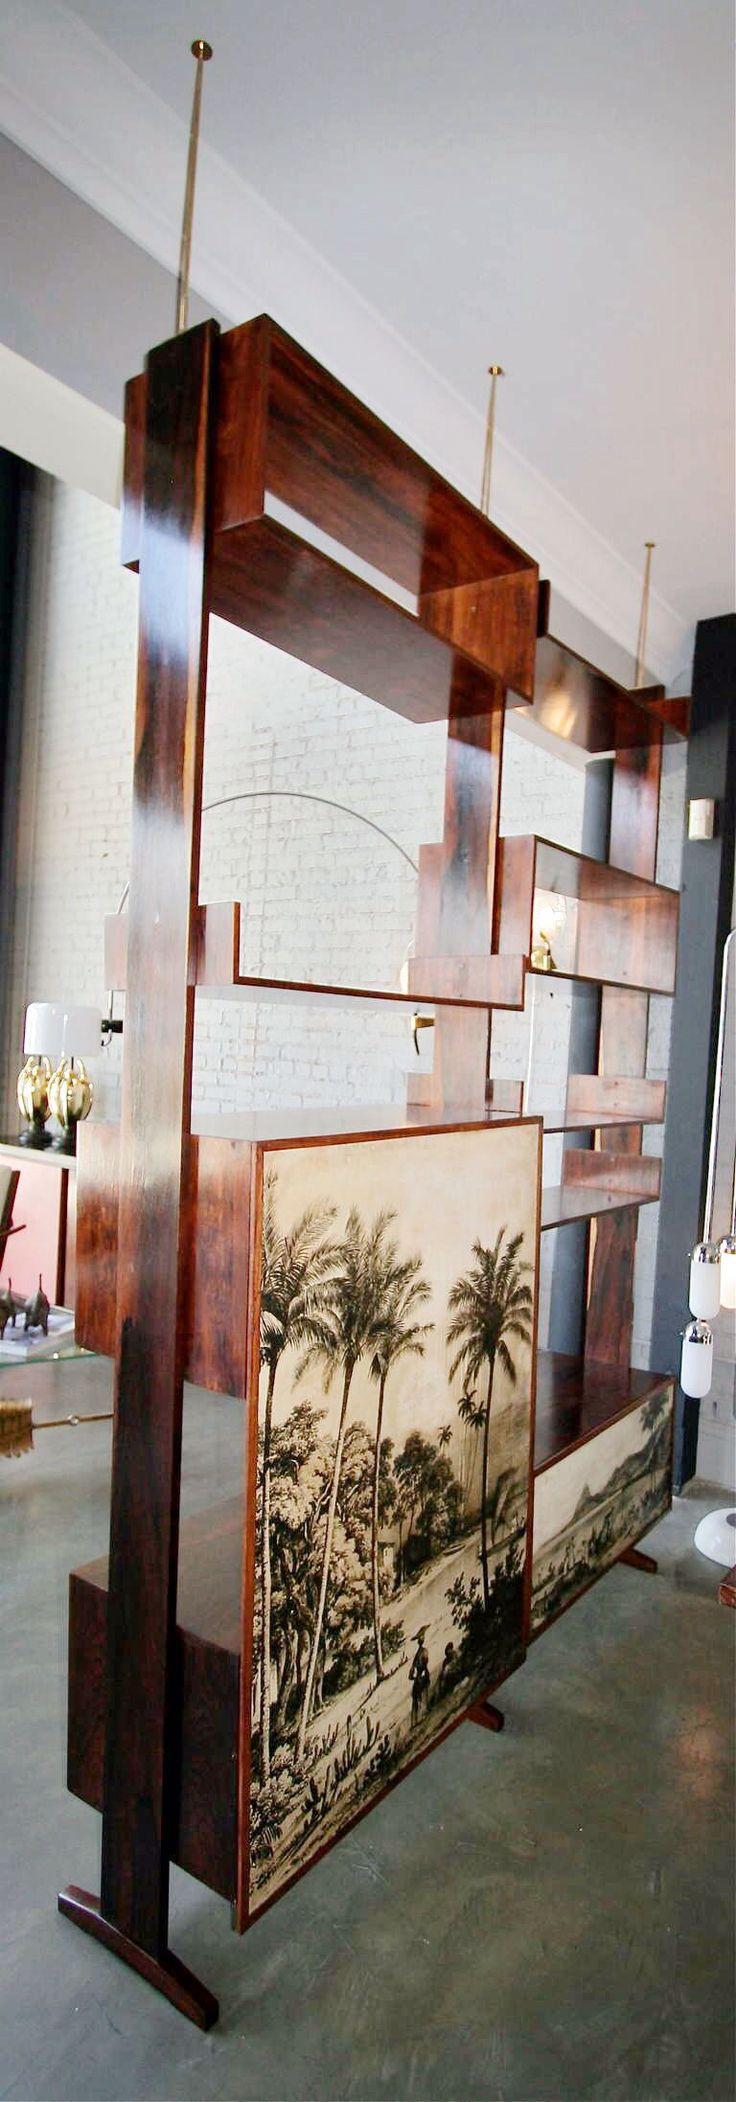 Bamboo Furniture Diy How To Make